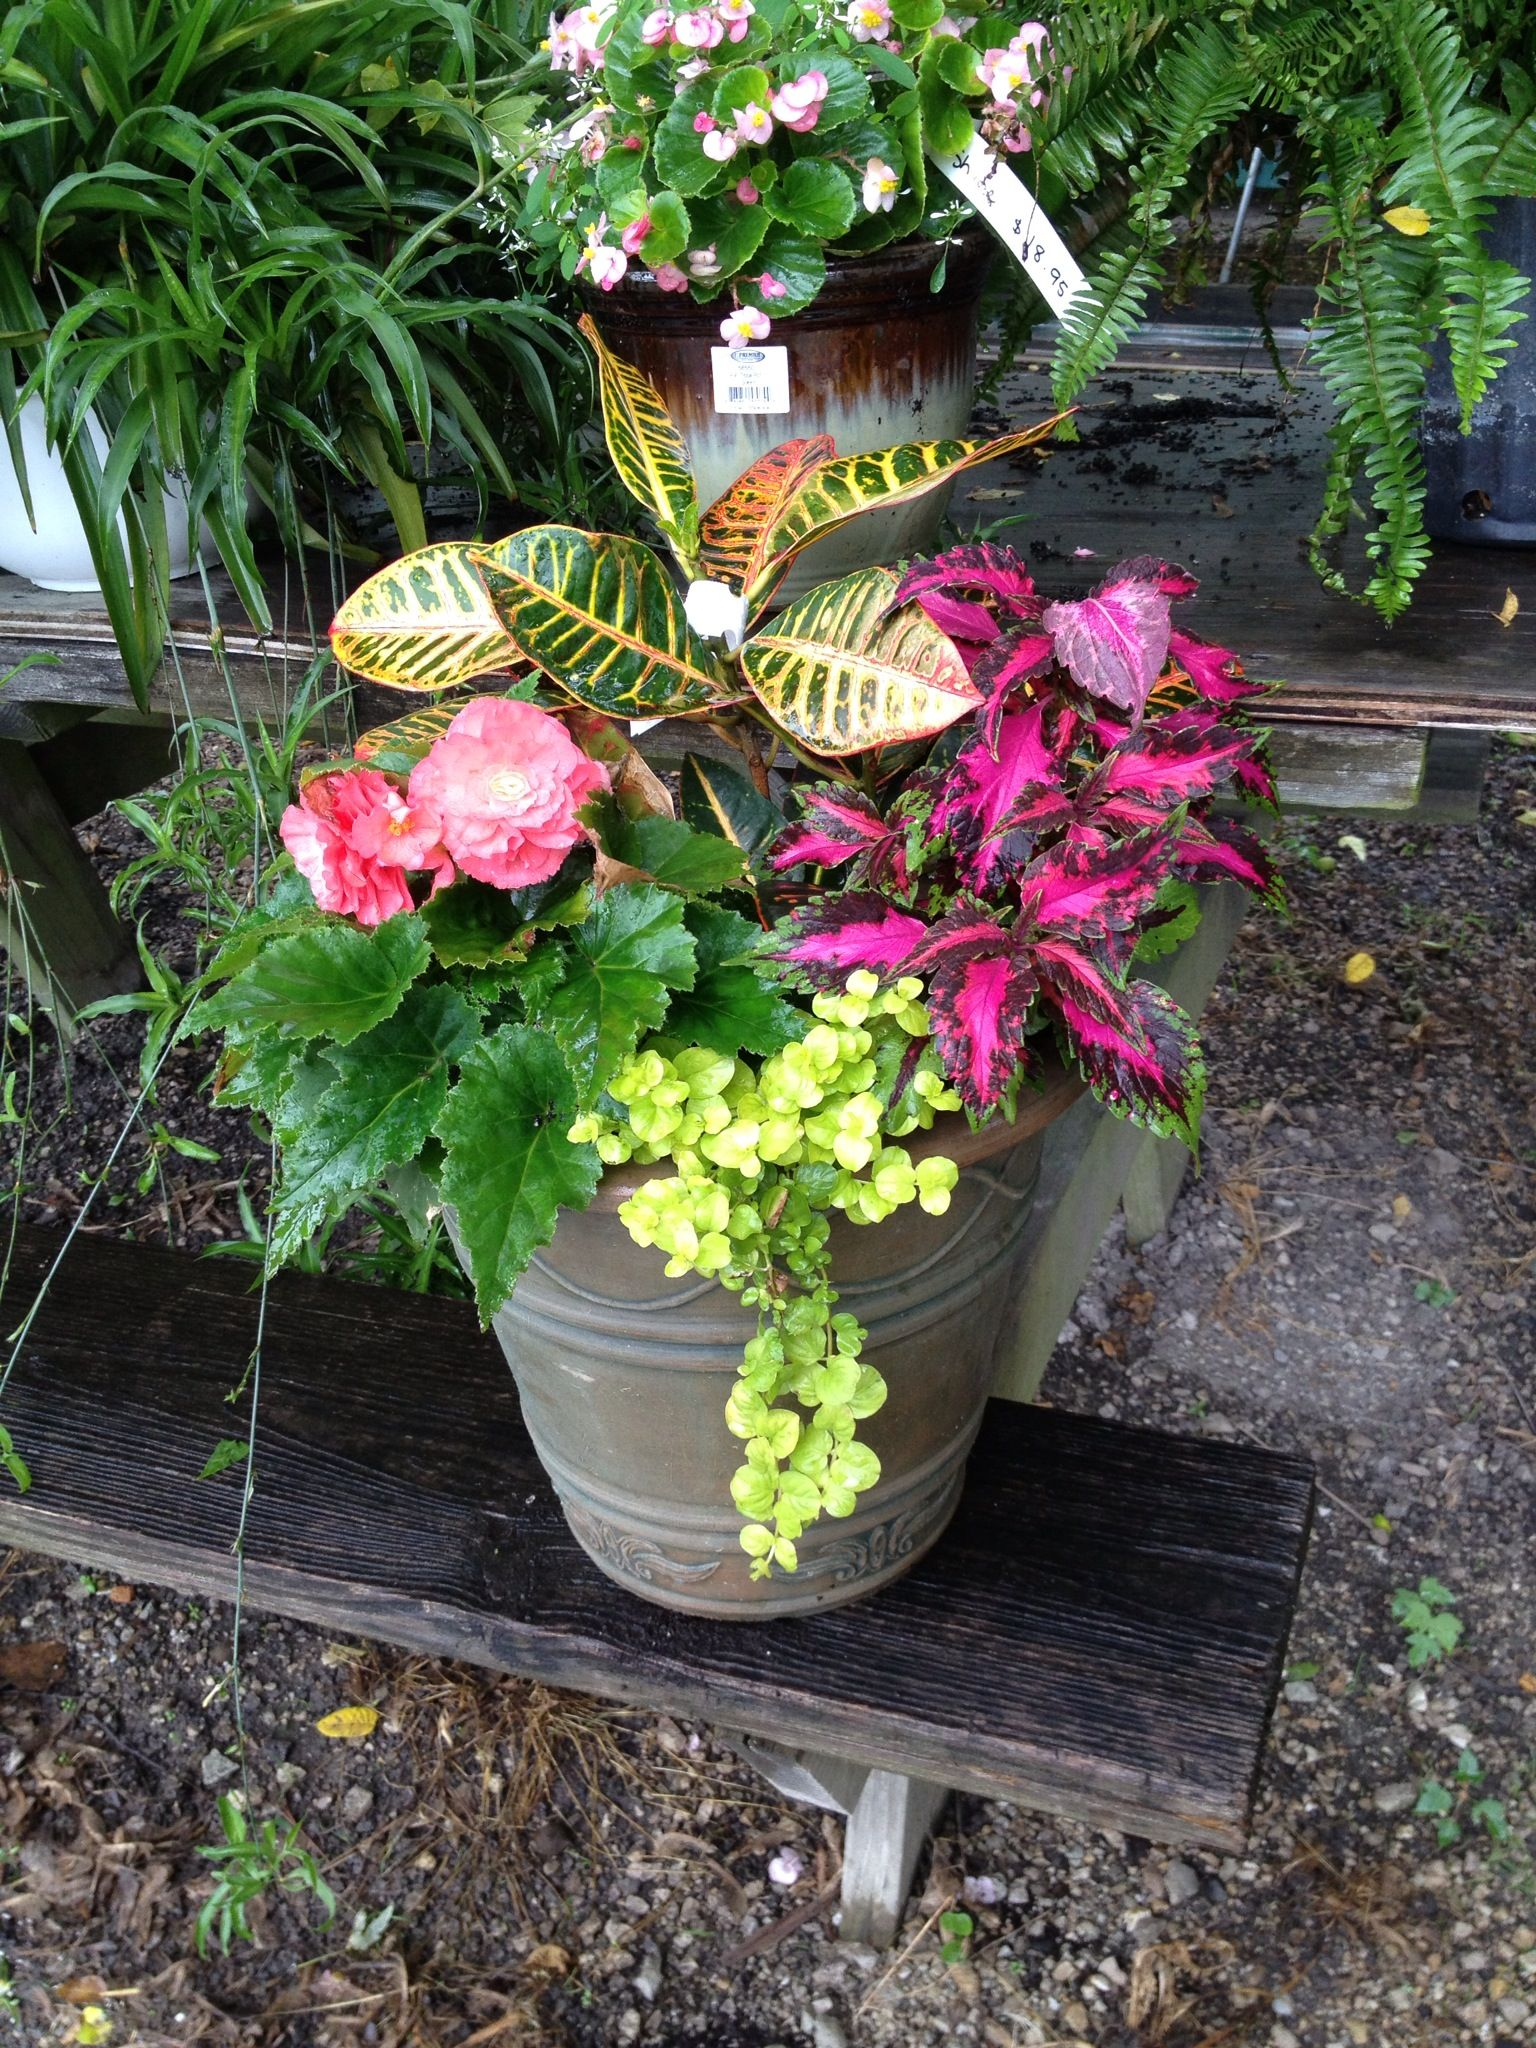 croton coleus tuberous begonia and creeping make for a colorful shade planter